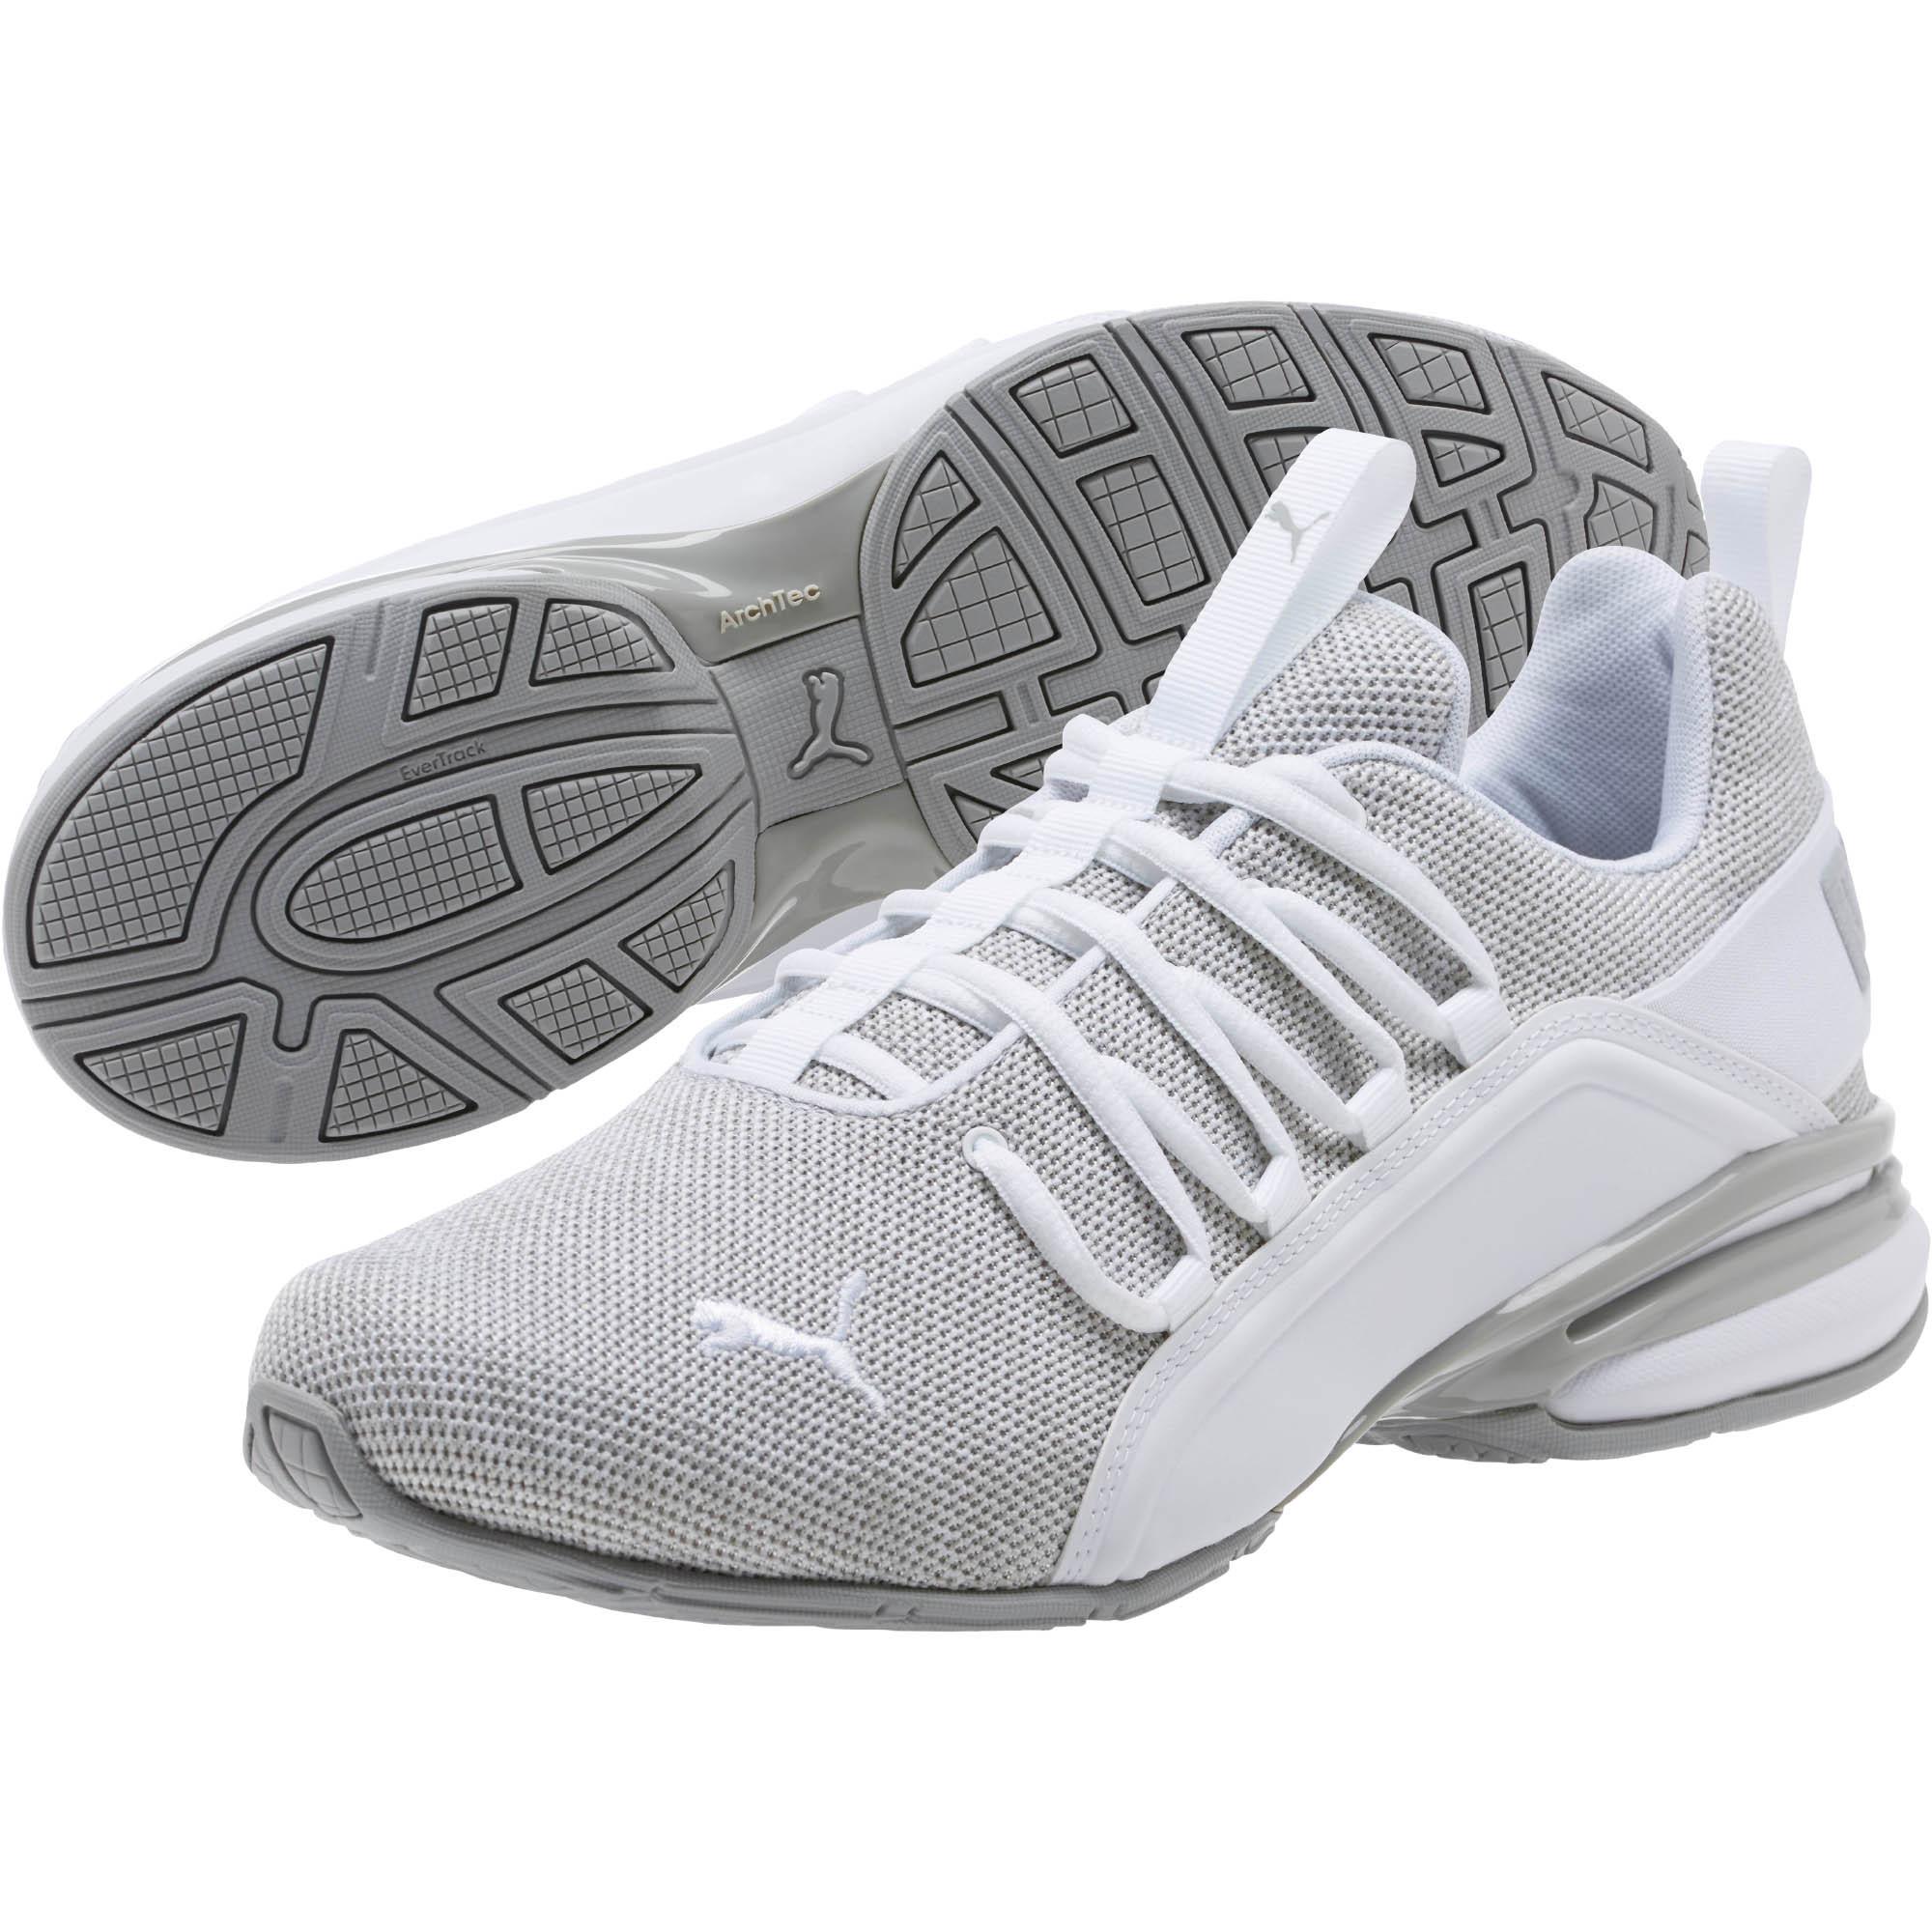 5d2fd9d306e Official Puma Store  PUMA Axelion Sneaker